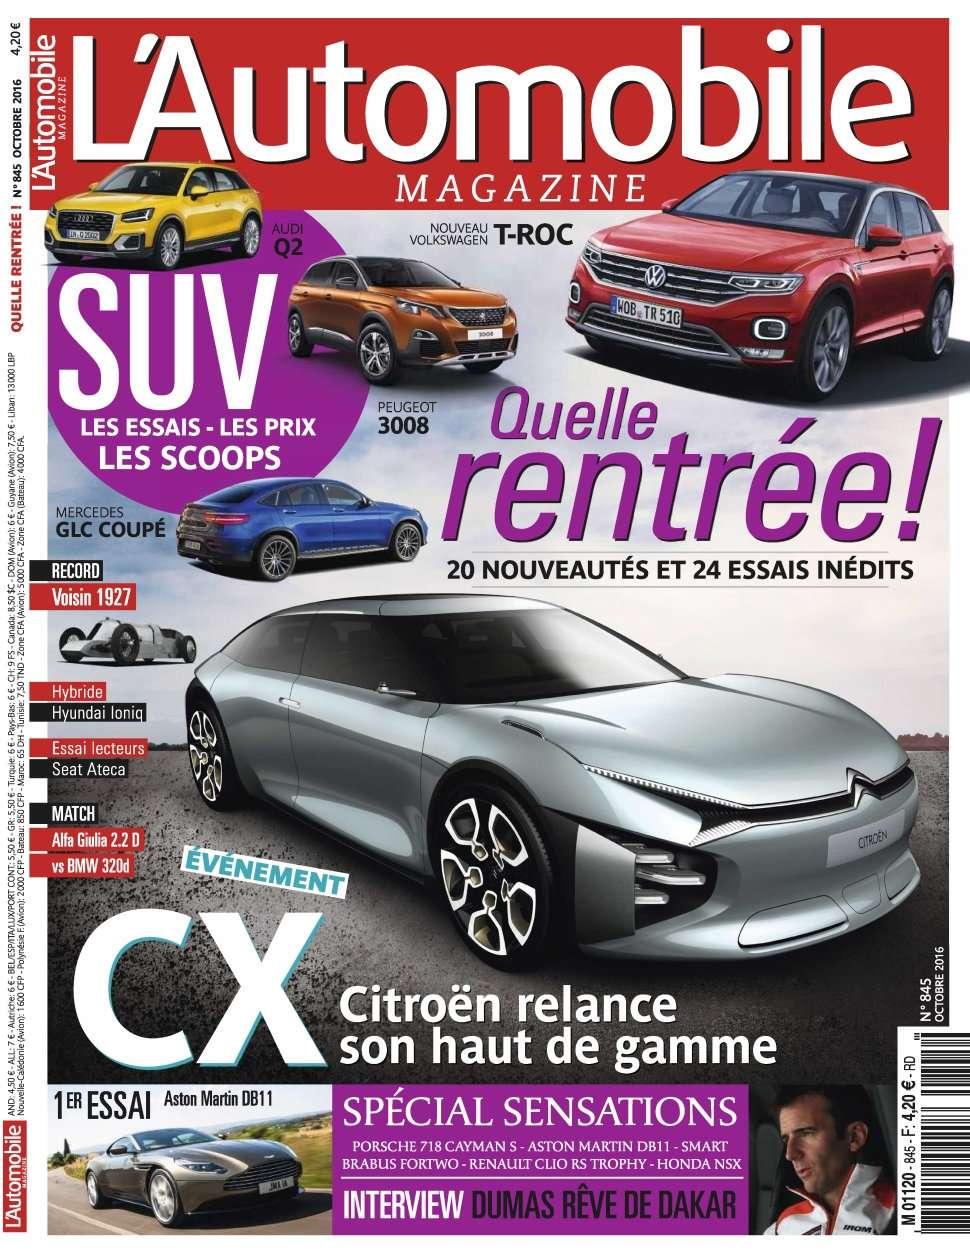 L'Automobile Magazine 845 - Octobre 2016